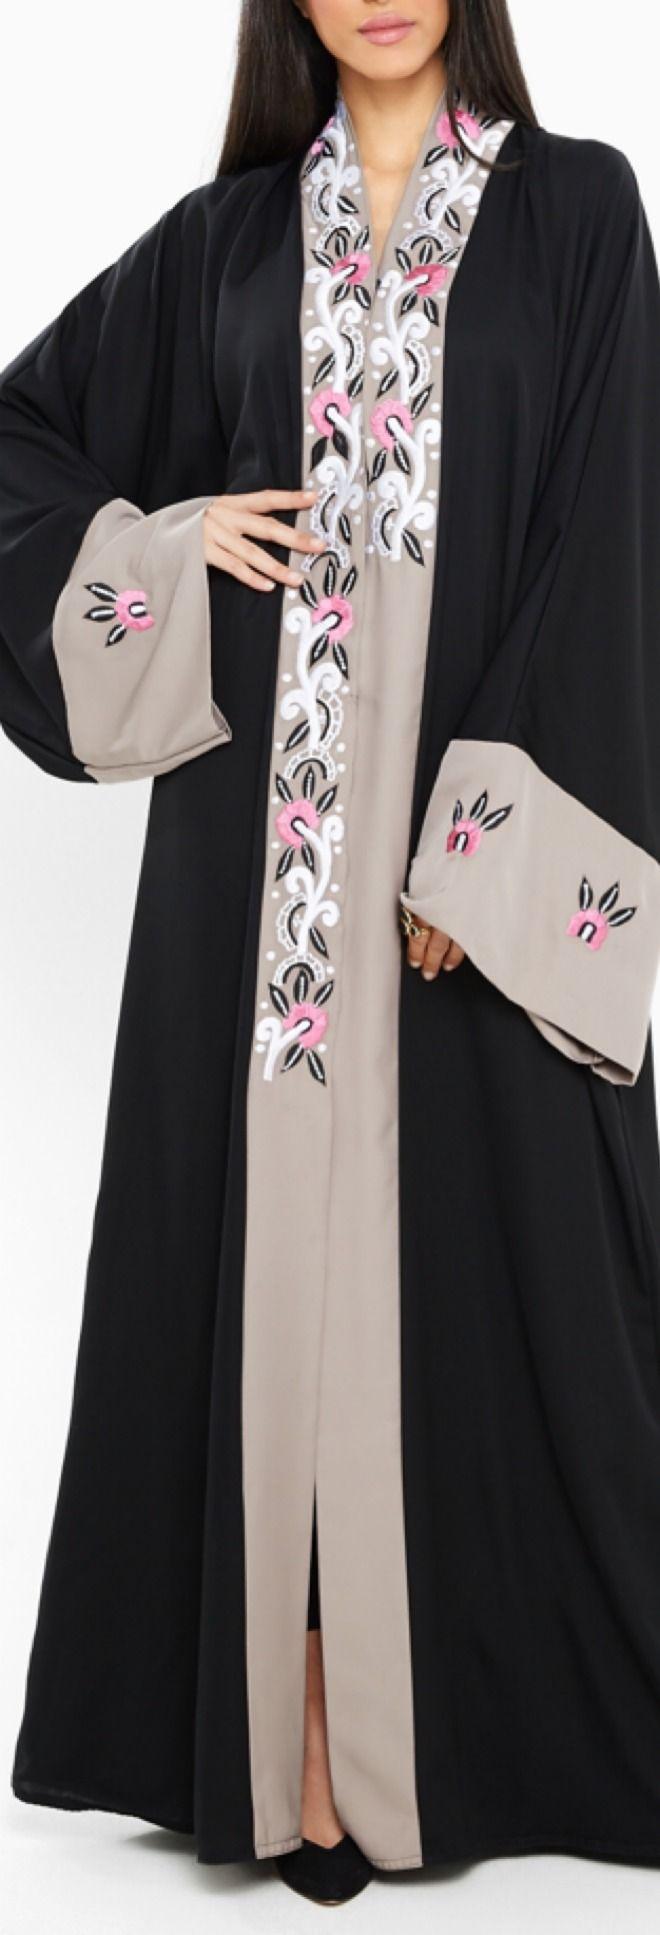 Malaikah Embroidered Open Abaya